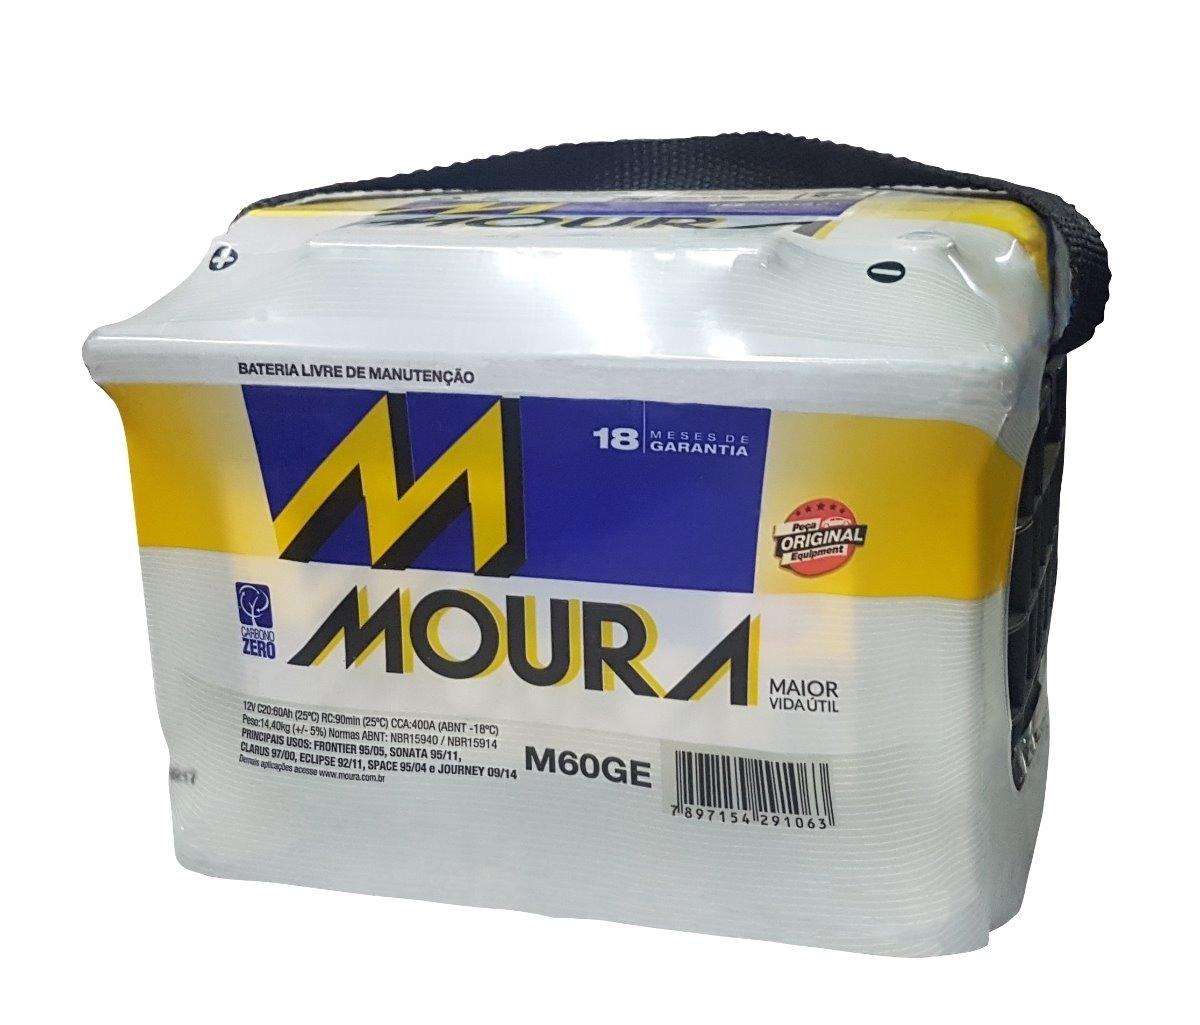 Bateria Moura 60Ah (M60GE) - Cantele Centro Automotivo